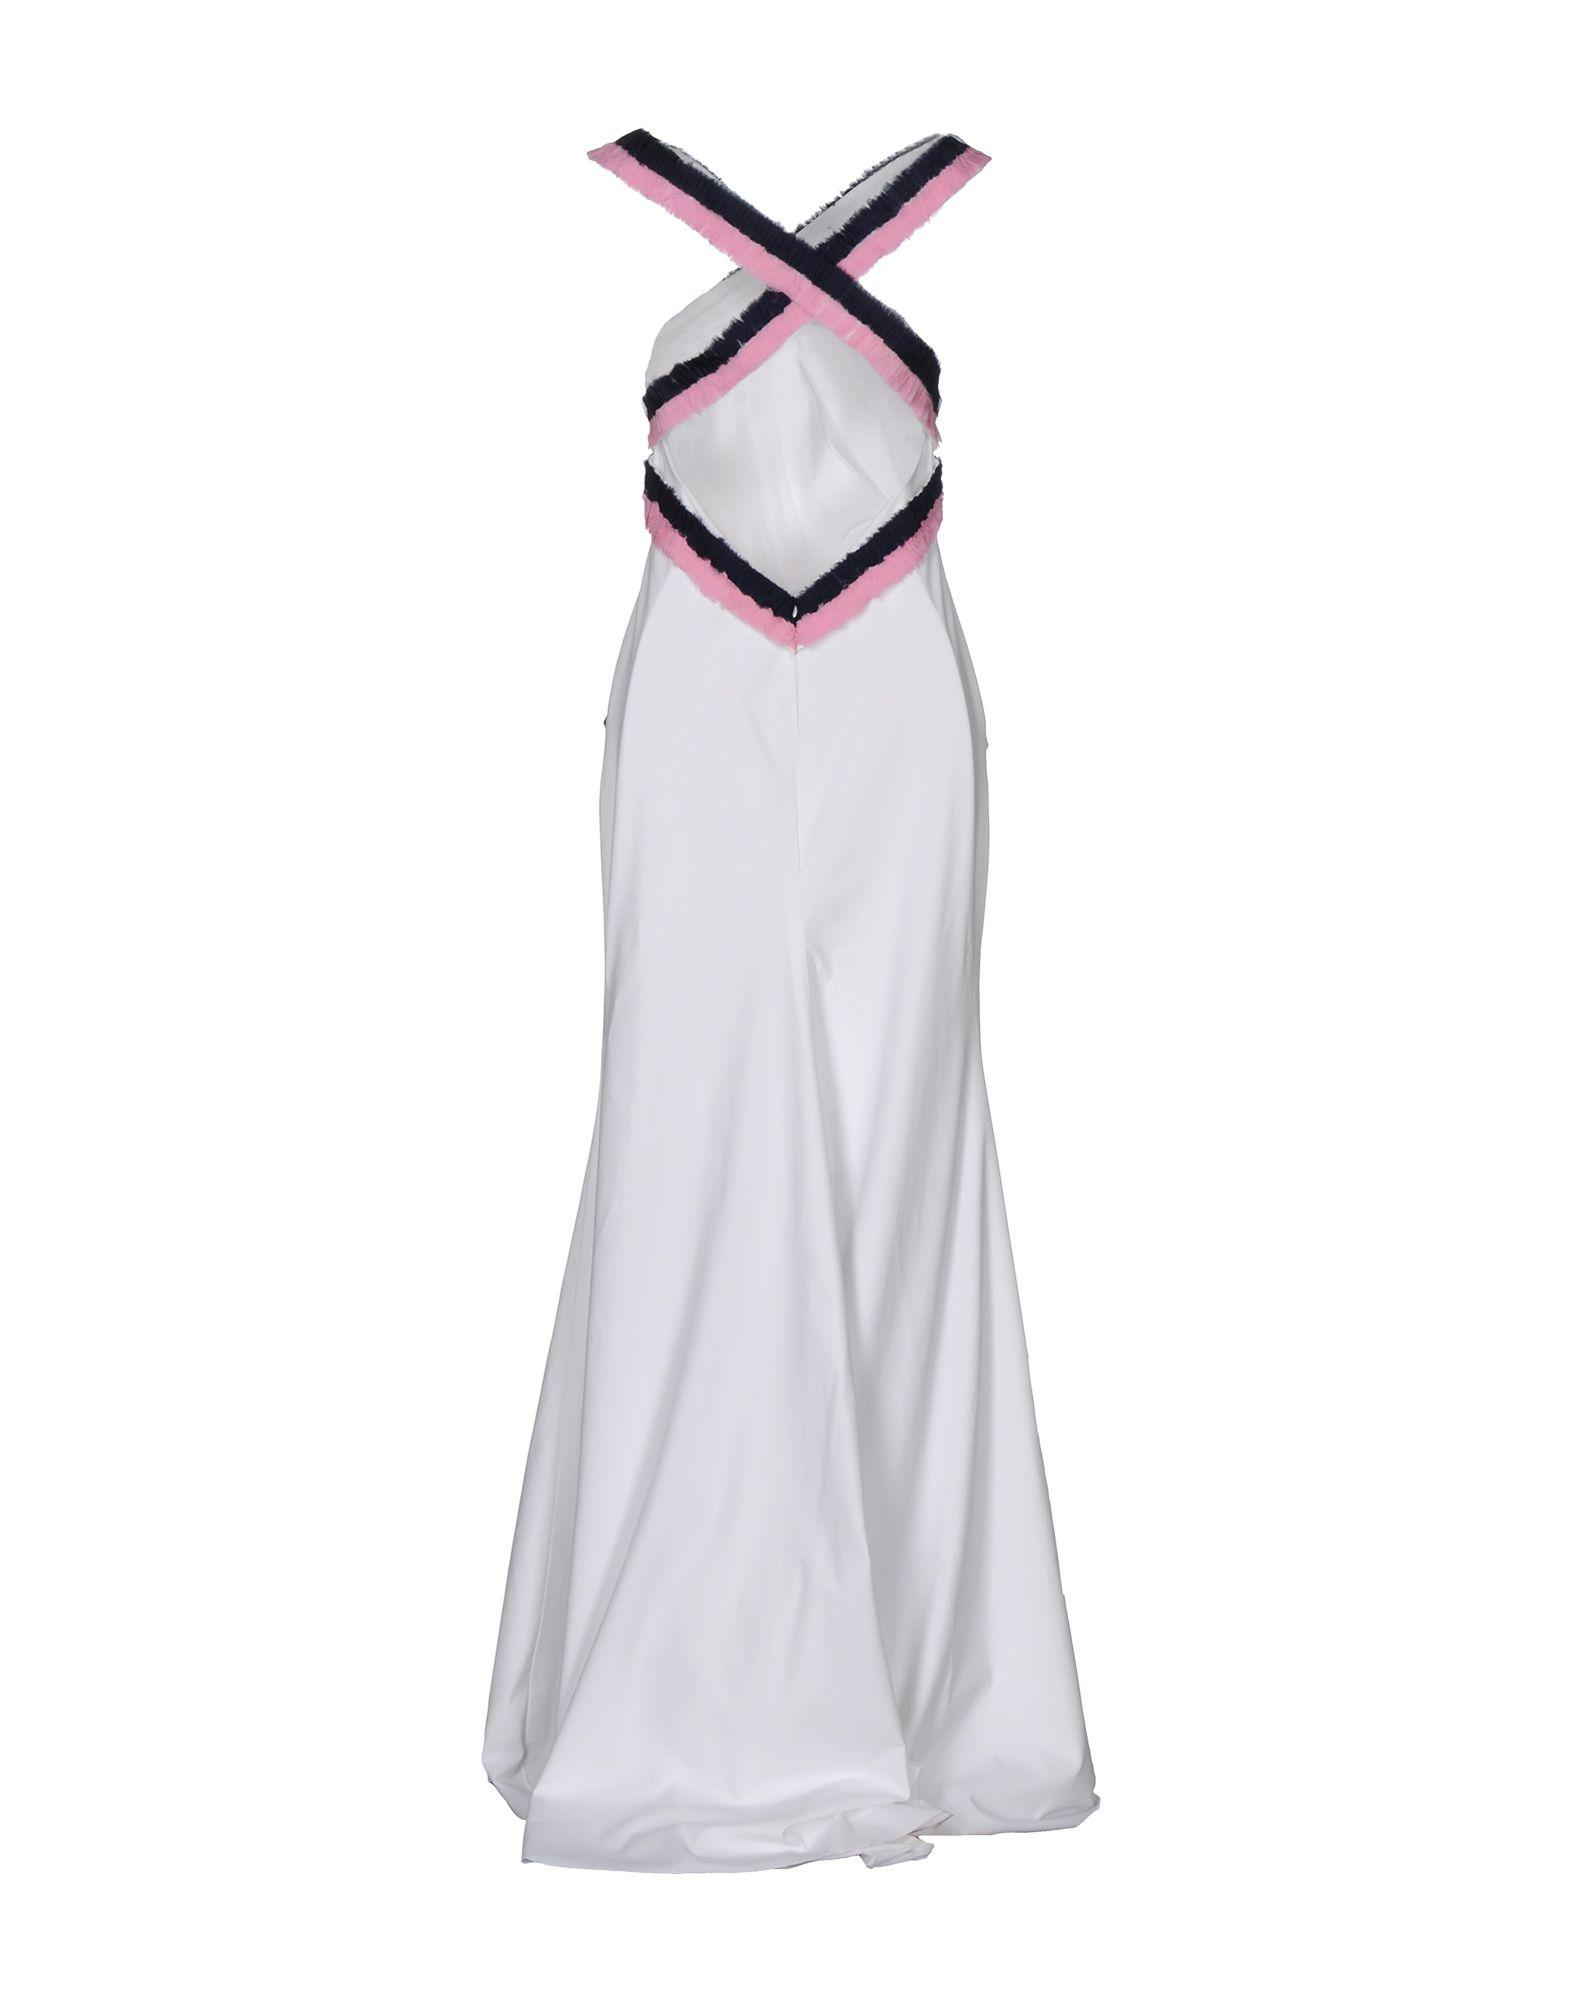 Release Dates Sale Online DRESSES - 3/4 length dresses Francesca Piccini Cheap Sale Inexpensive Cheap Sale Wide Range Of Sale Free Shipping Cheap Sale Enjoy FcWdniPGNA